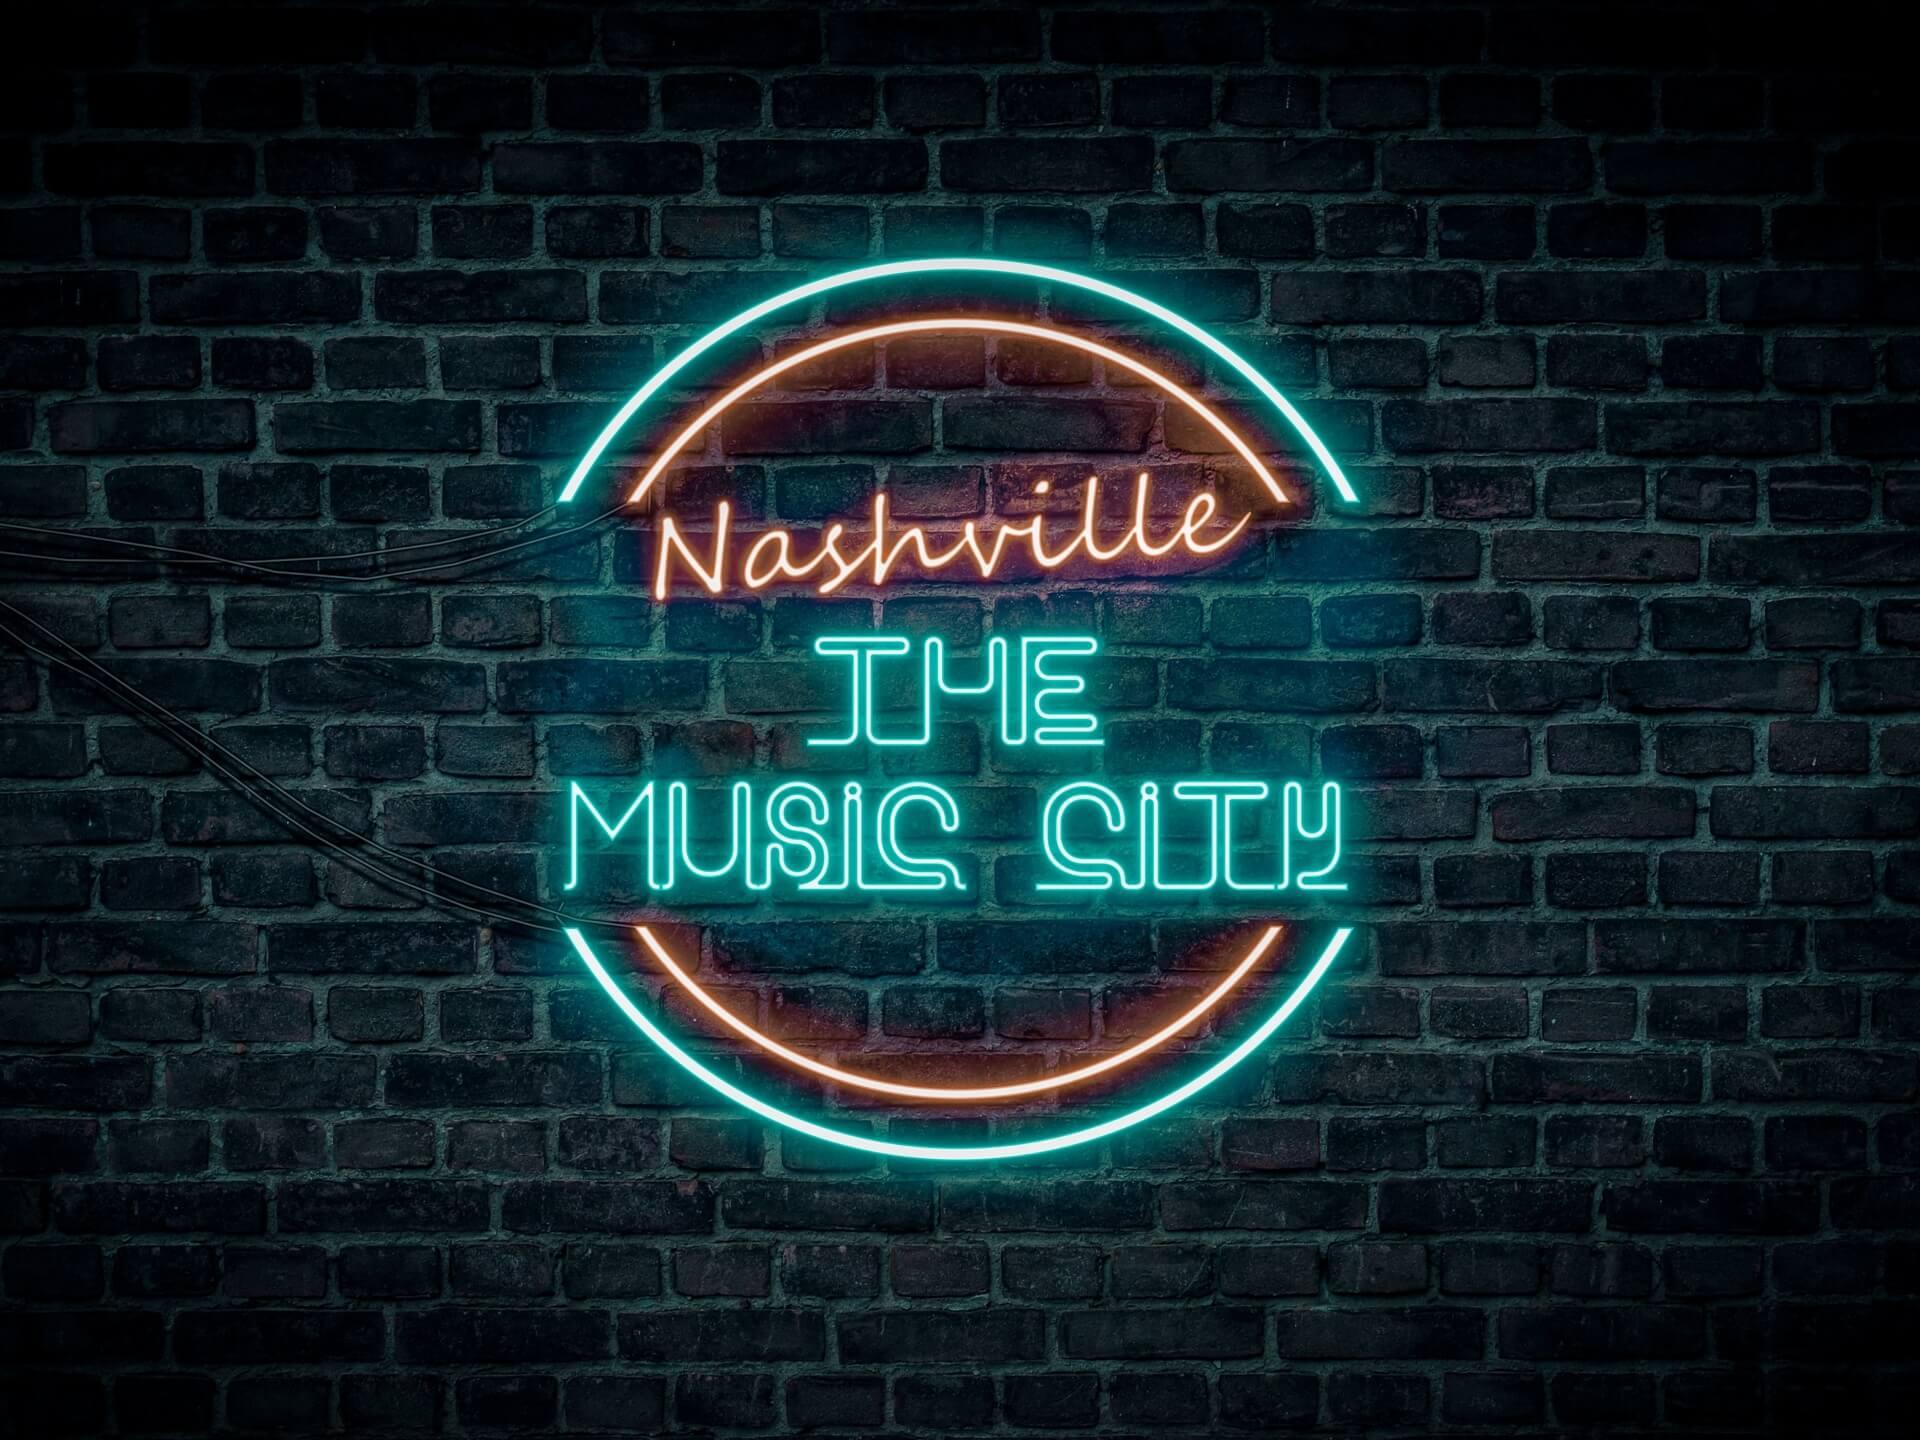 Global Gates Gateway City Nashville